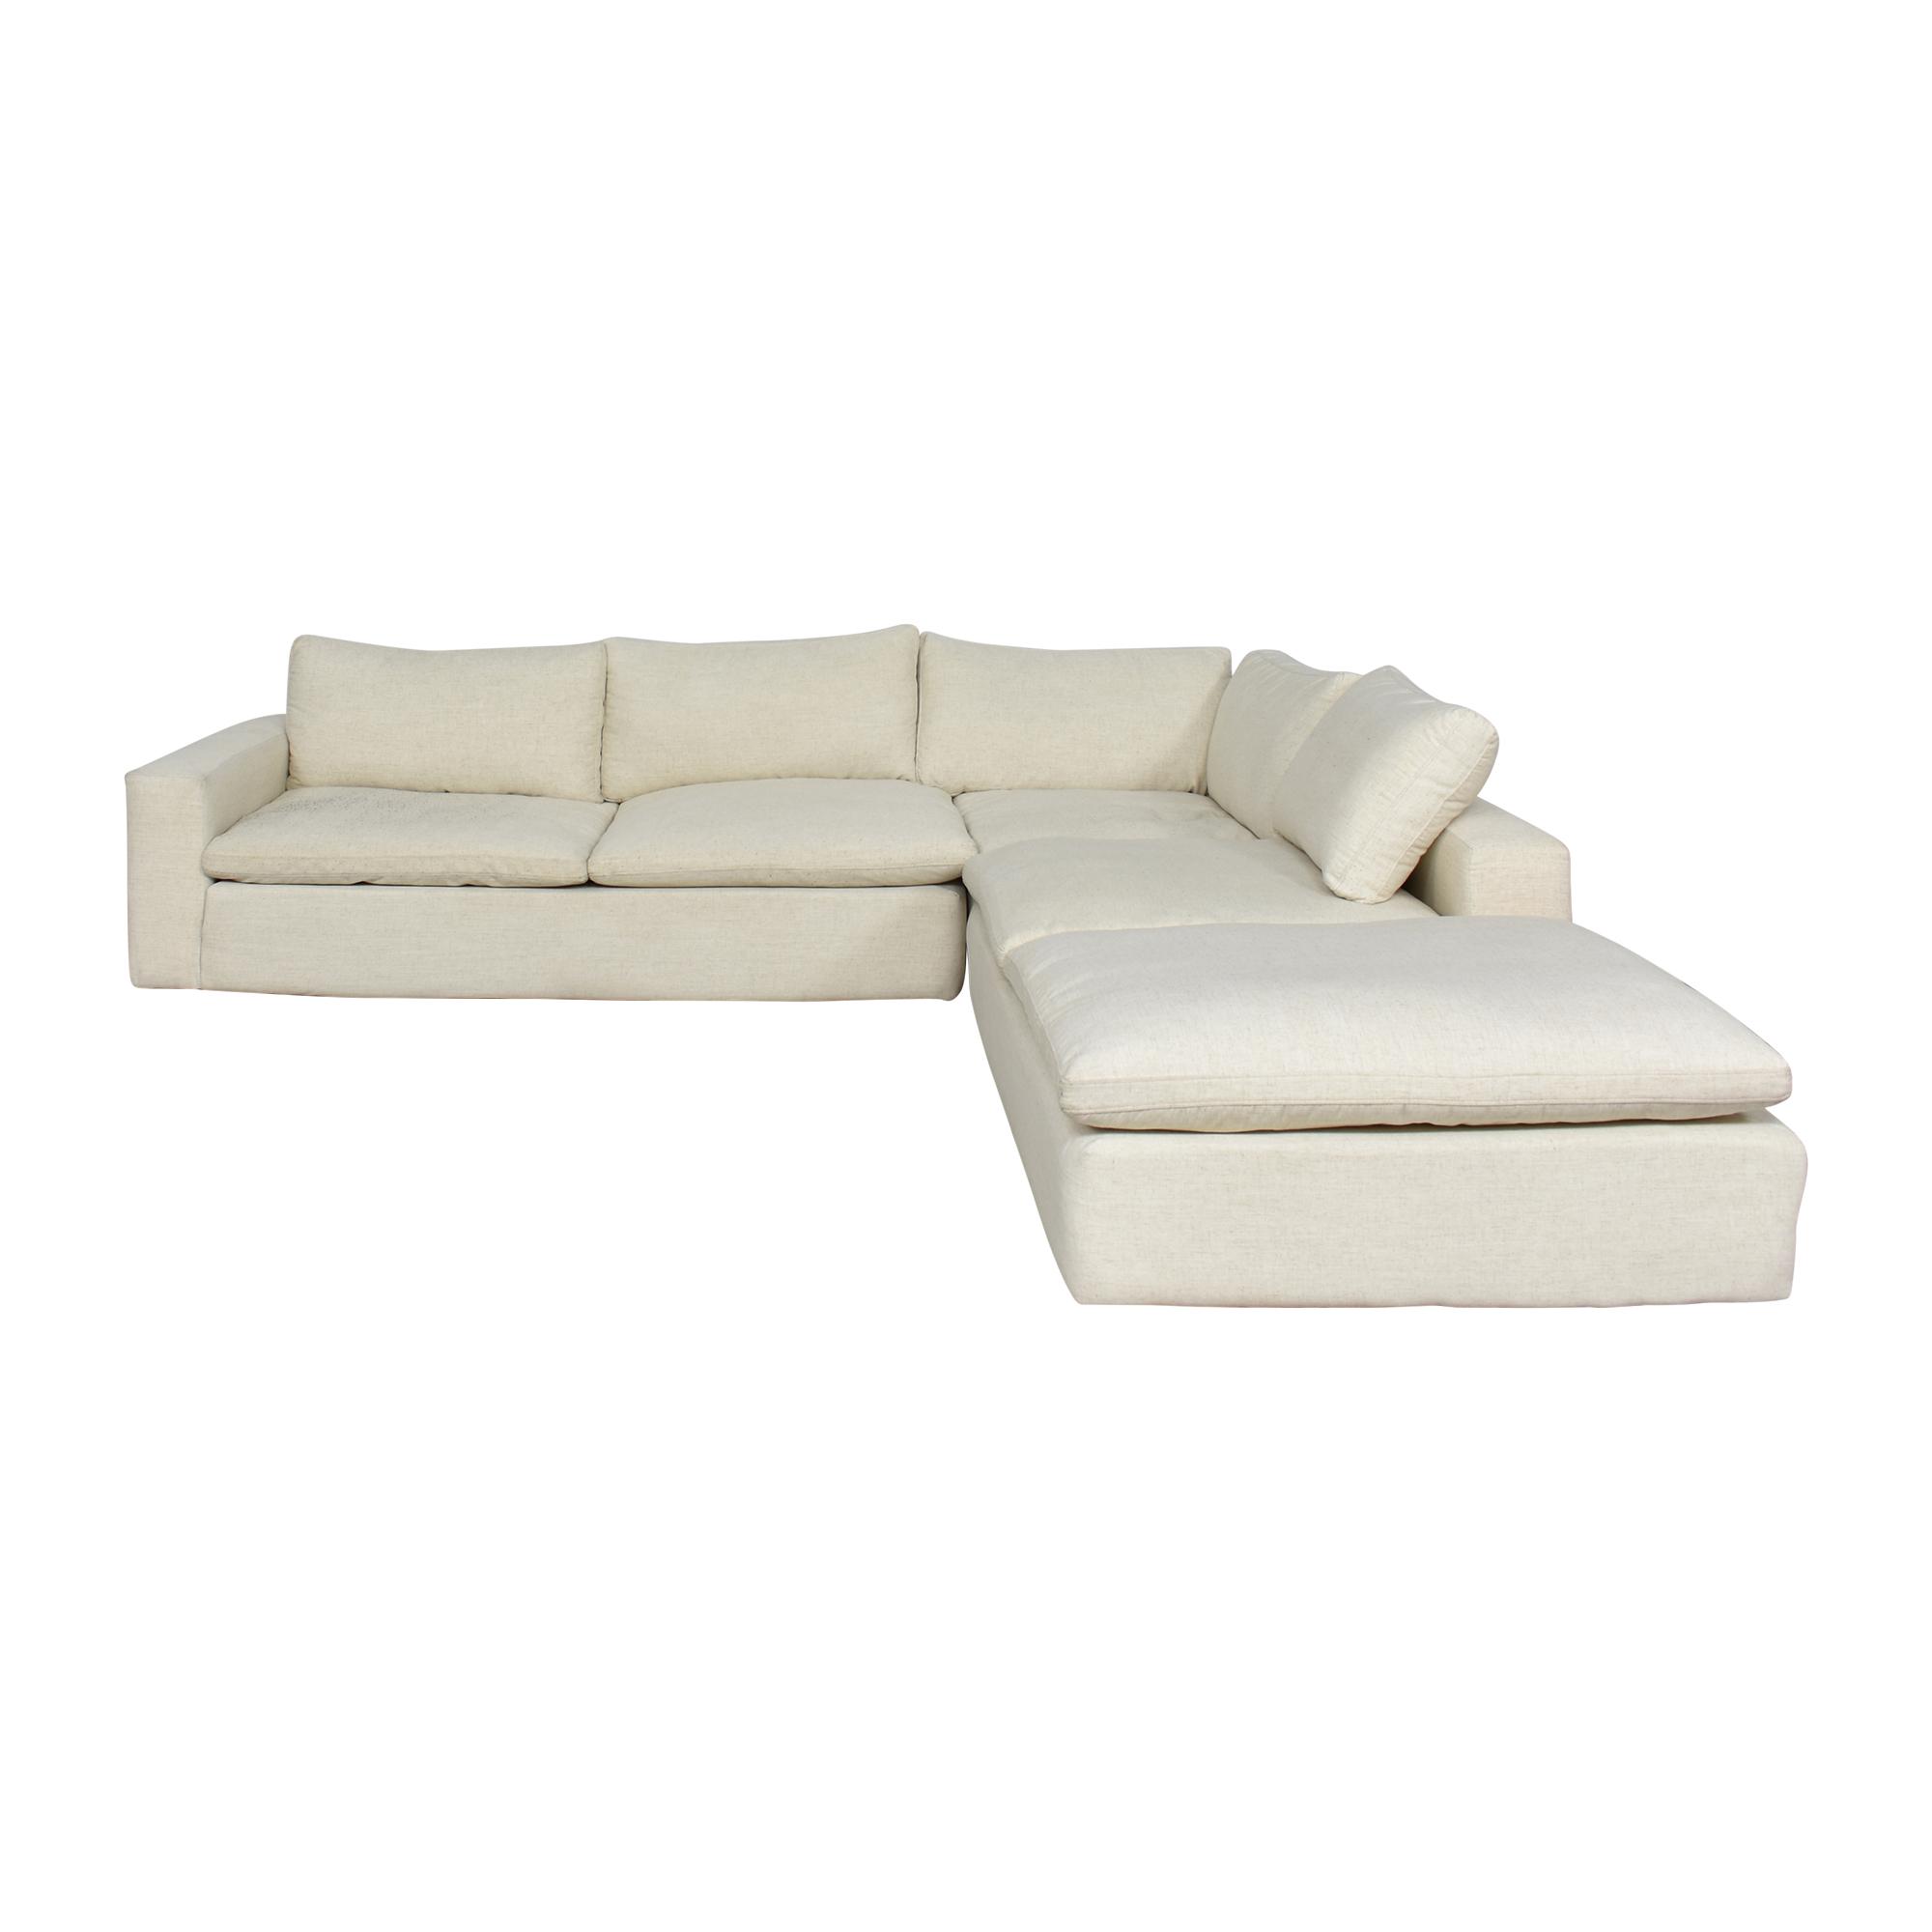 Living Spaces Utopia Three Piece Sectional Sofa / Sofas